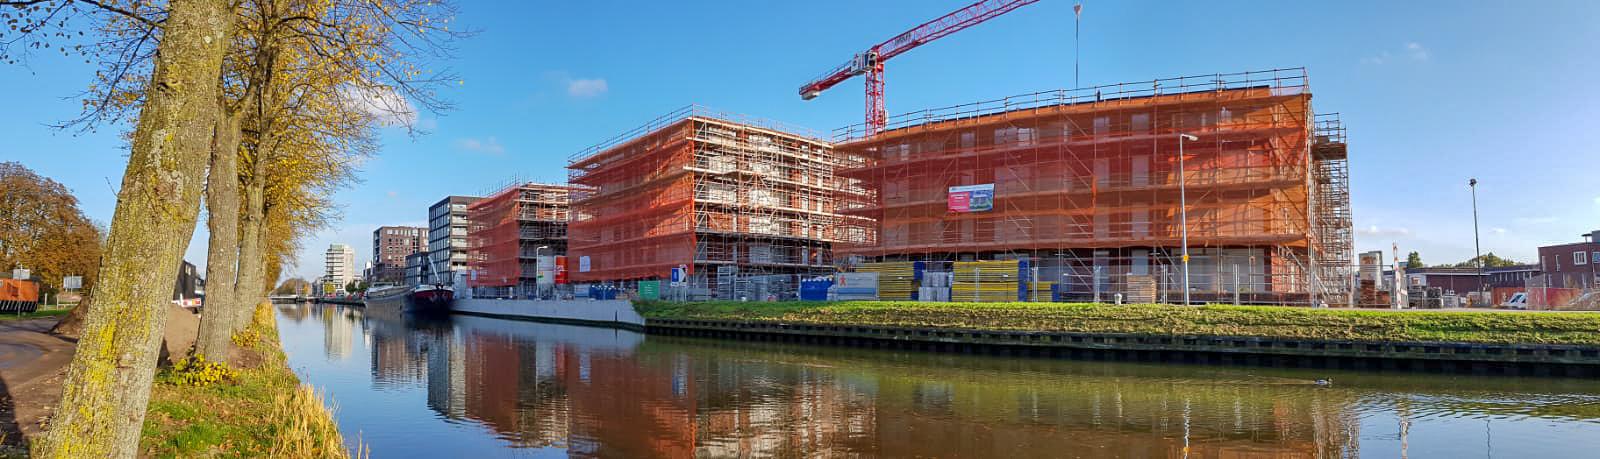 De bouw van Park ZuytWillemsvaert fase 1 vordert